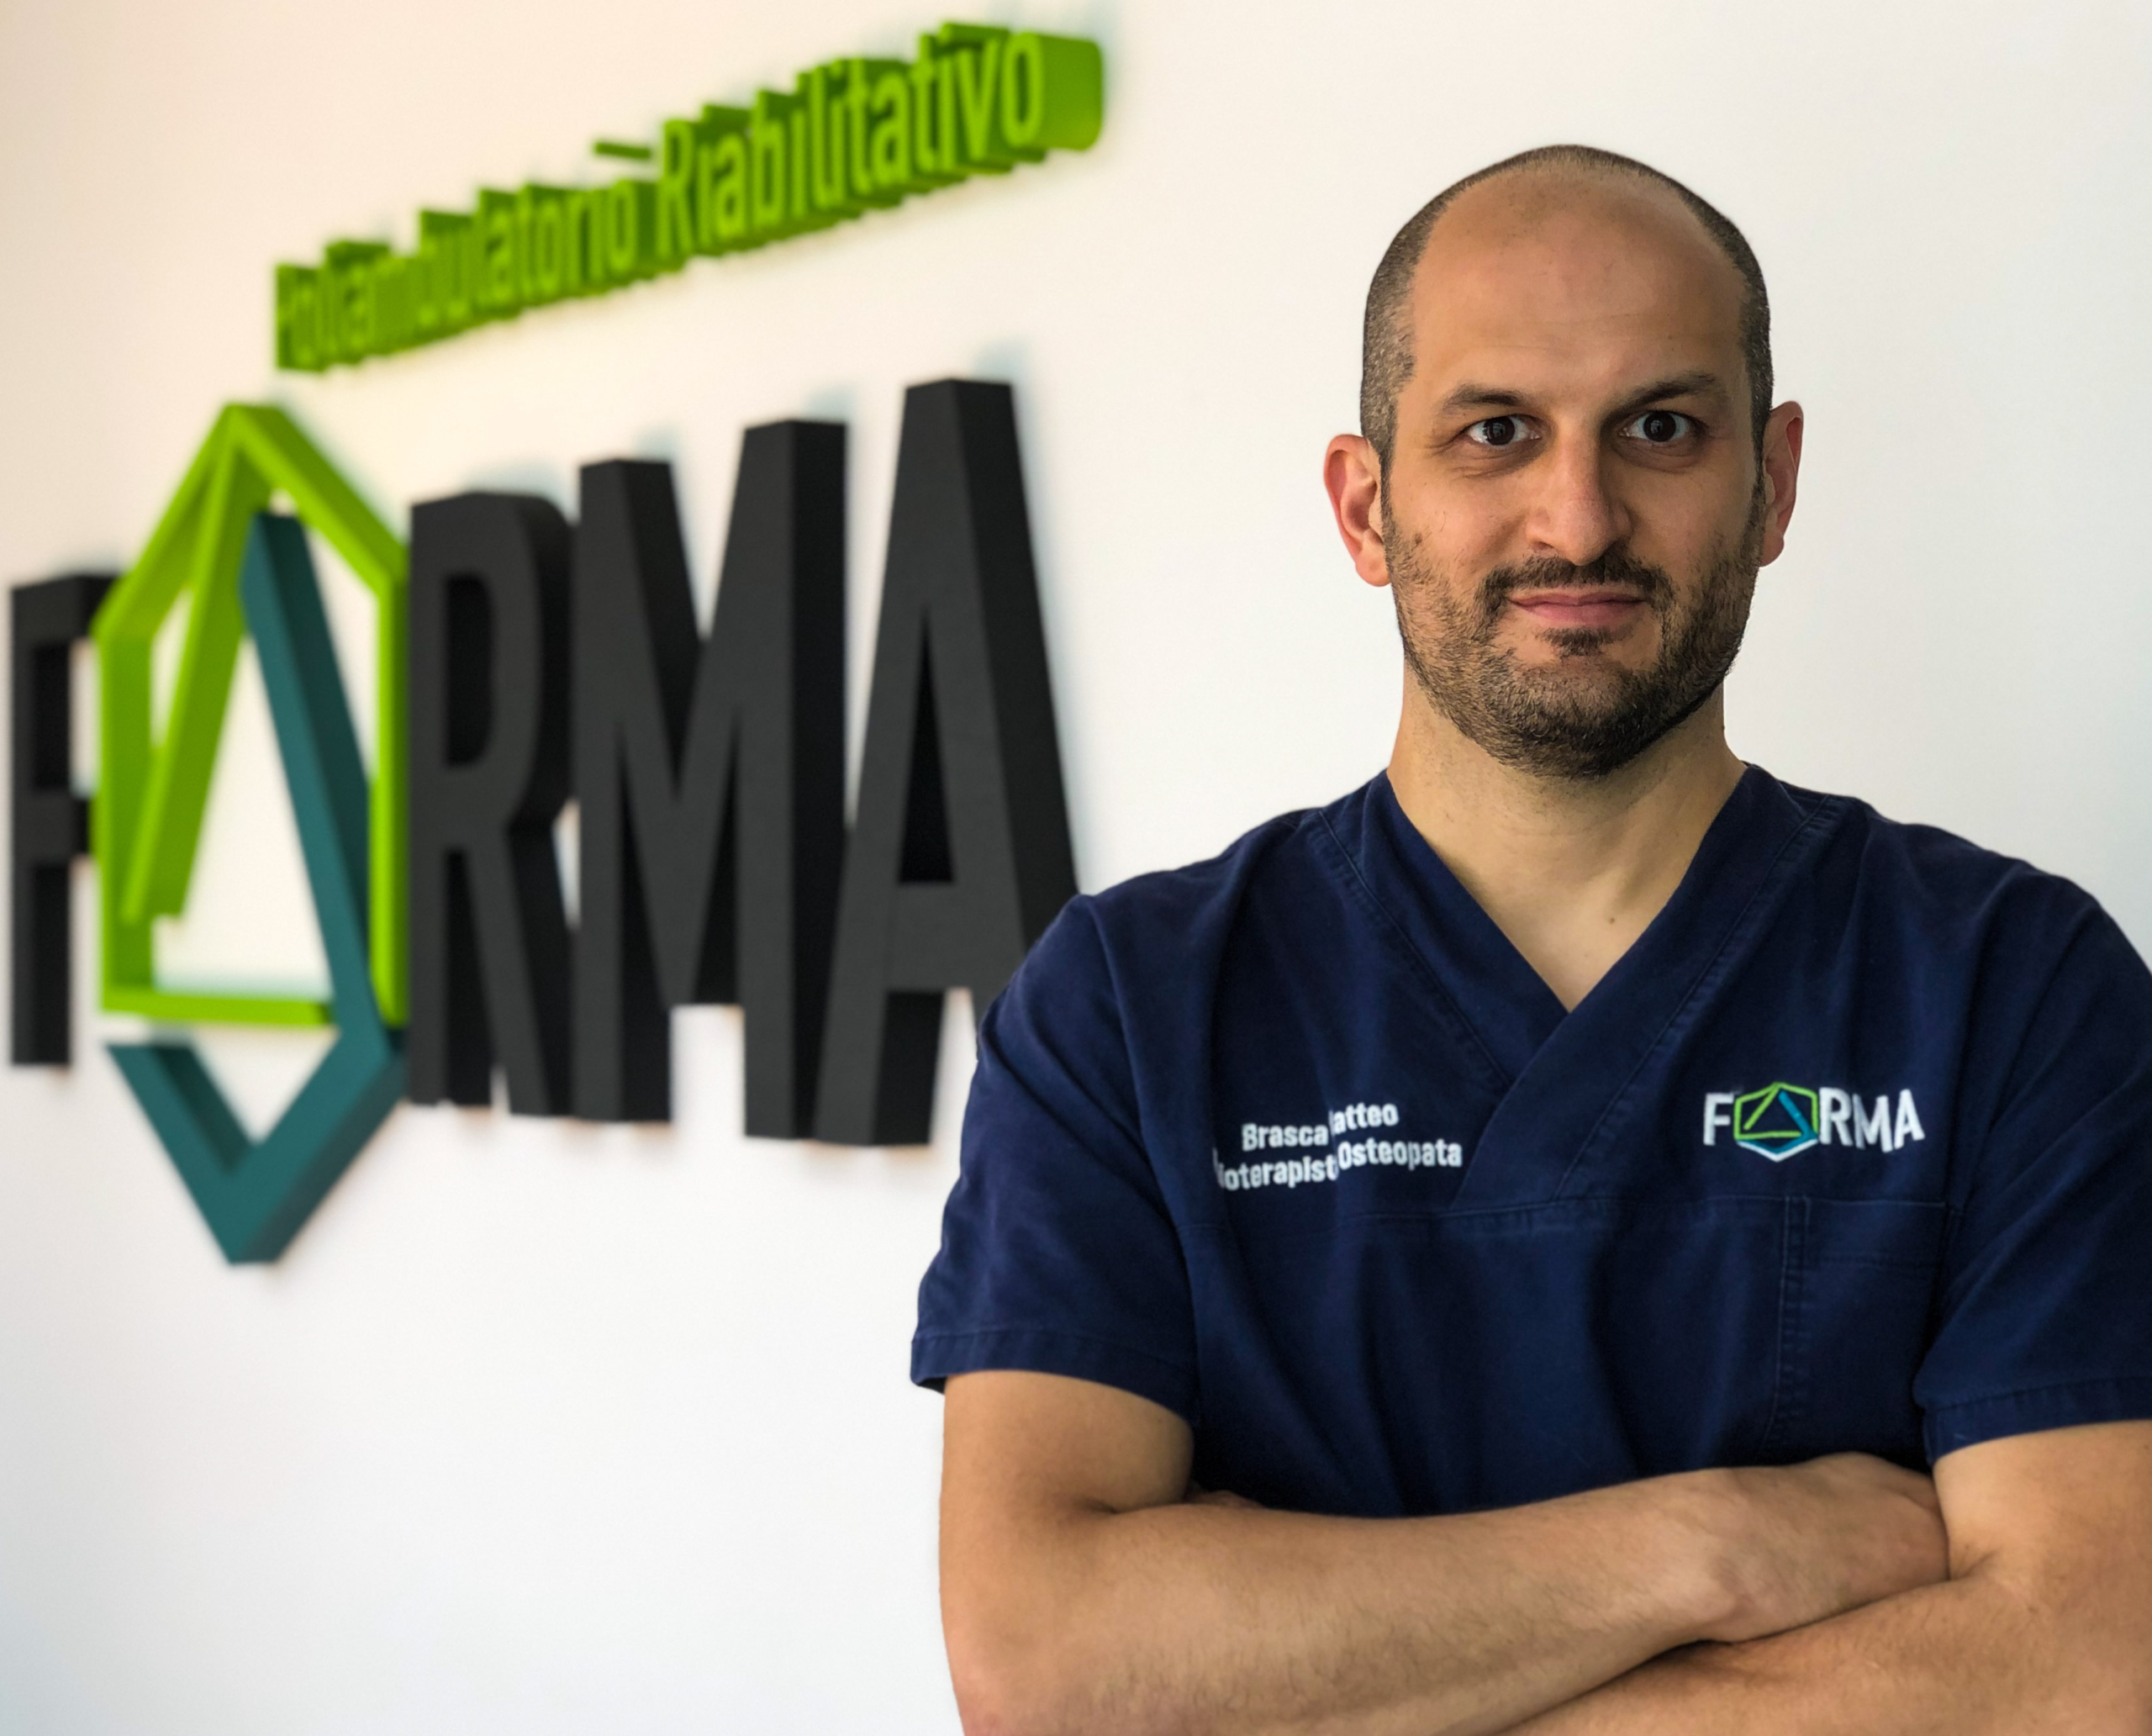 Dott Brasca Matteo Fisioterapista Osteopata FORMA Poliambulatorio